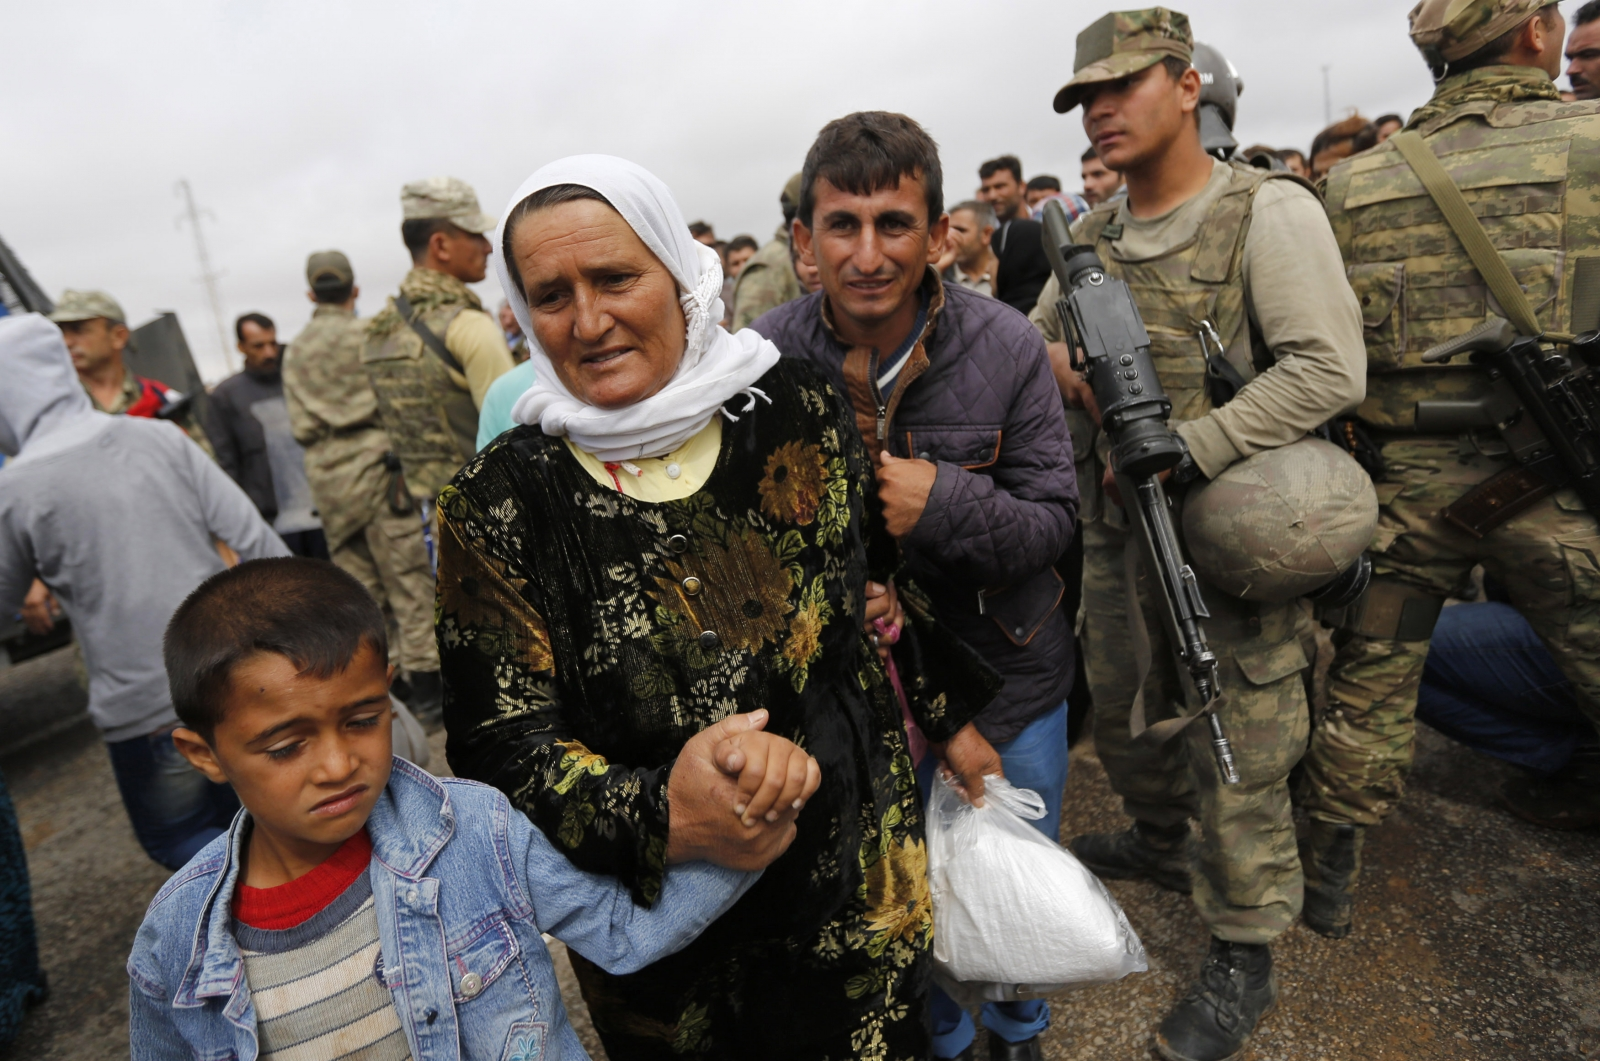 Syrian Kurds walk through Mursitpinar border crossing to return to their homes in the Syrian city of Kobani